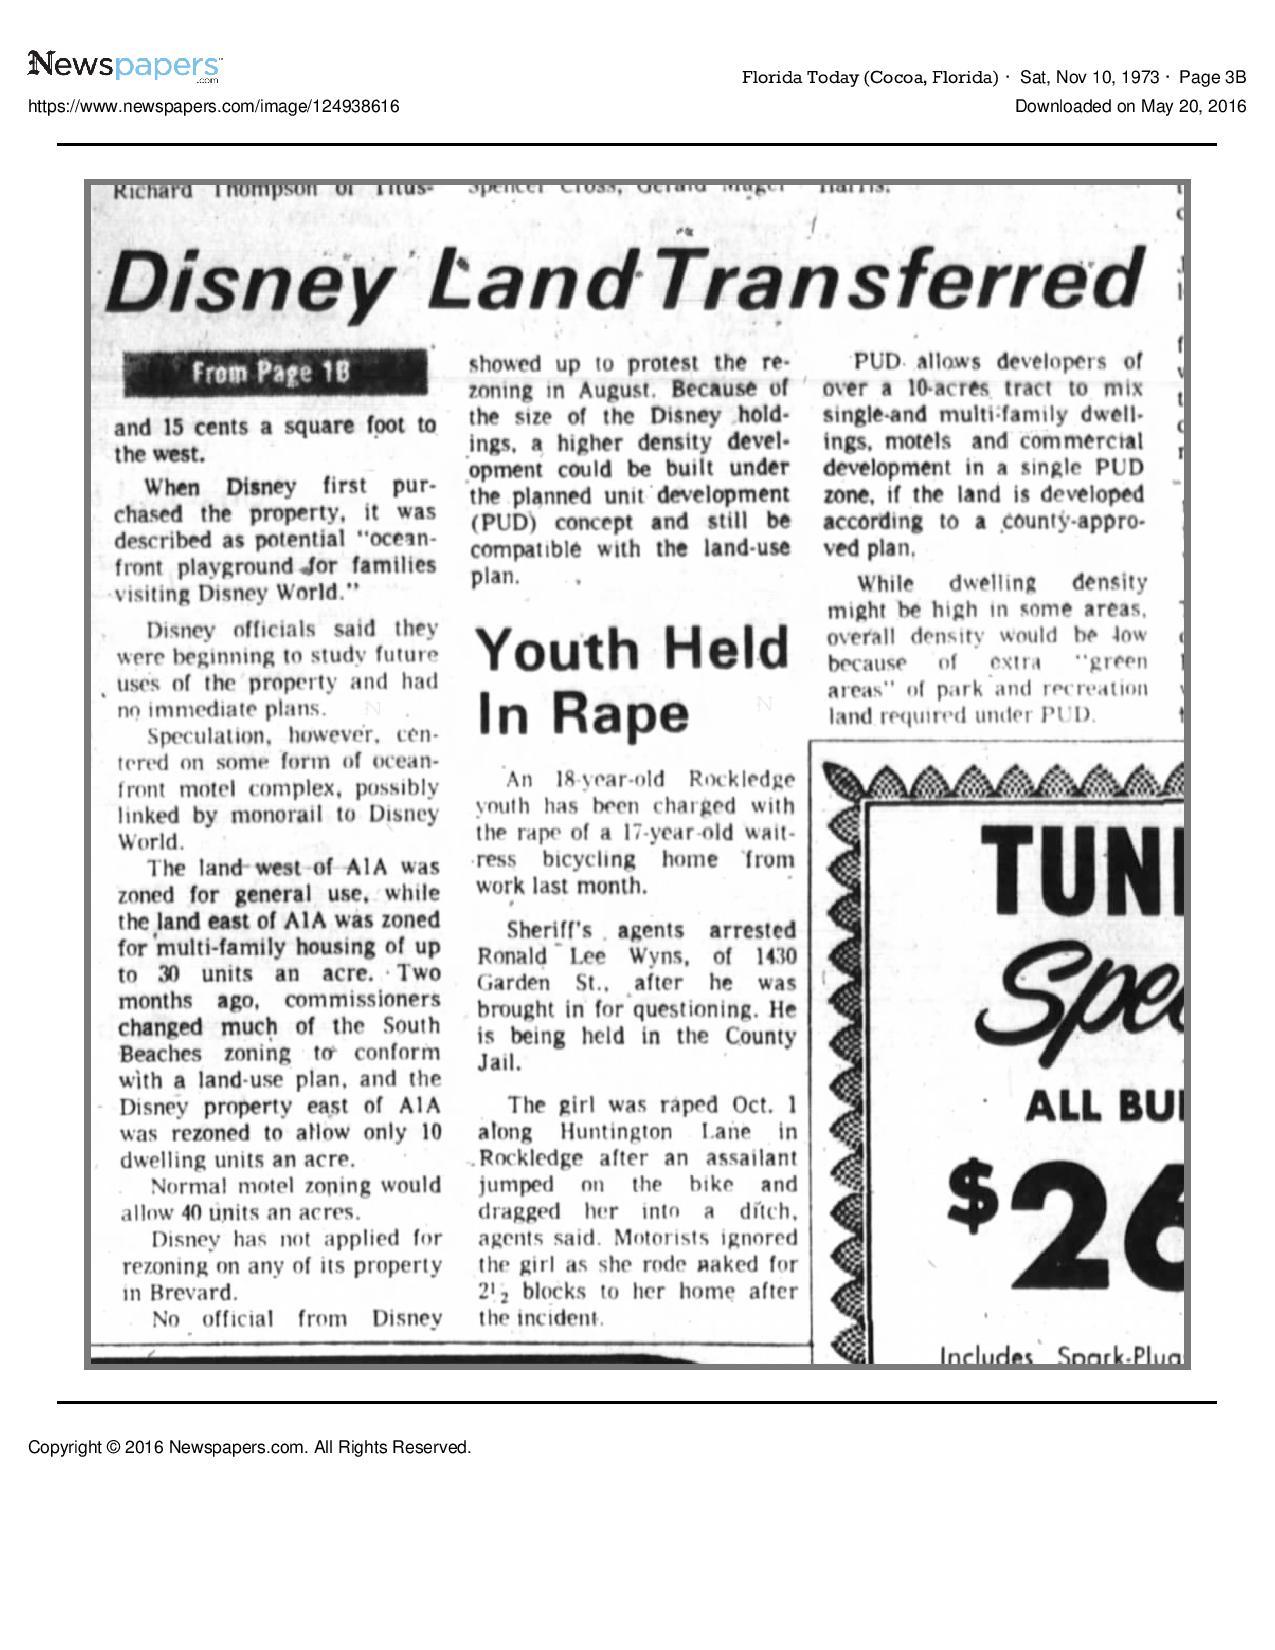 landtransfer2-page-001.jpg